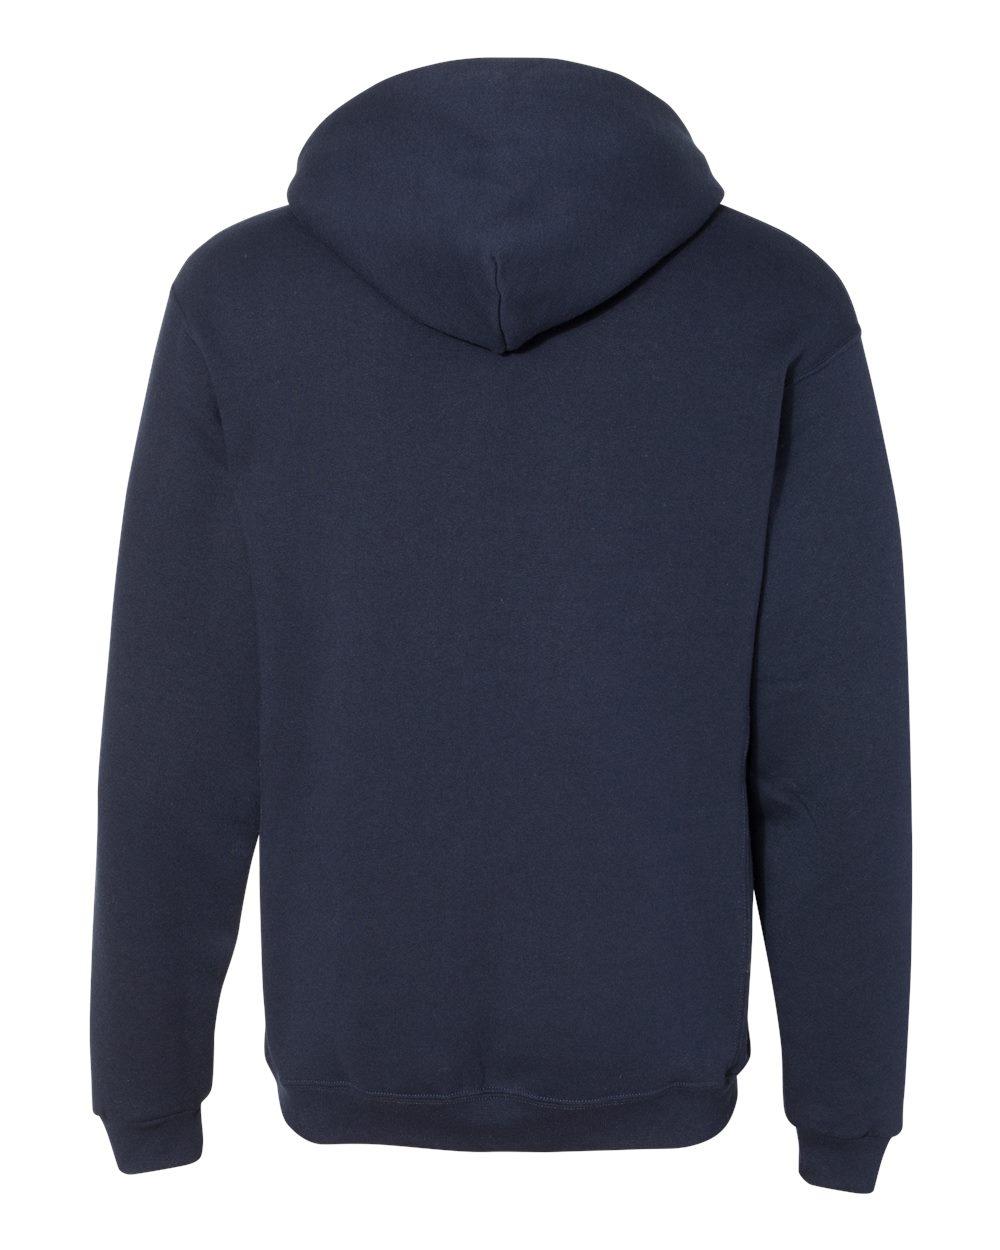 Russell-Athletic-Blank-Plain-Hooded-Full-Zip-Sweatshirt-697HBM-up-to-3XL thumbnail 10